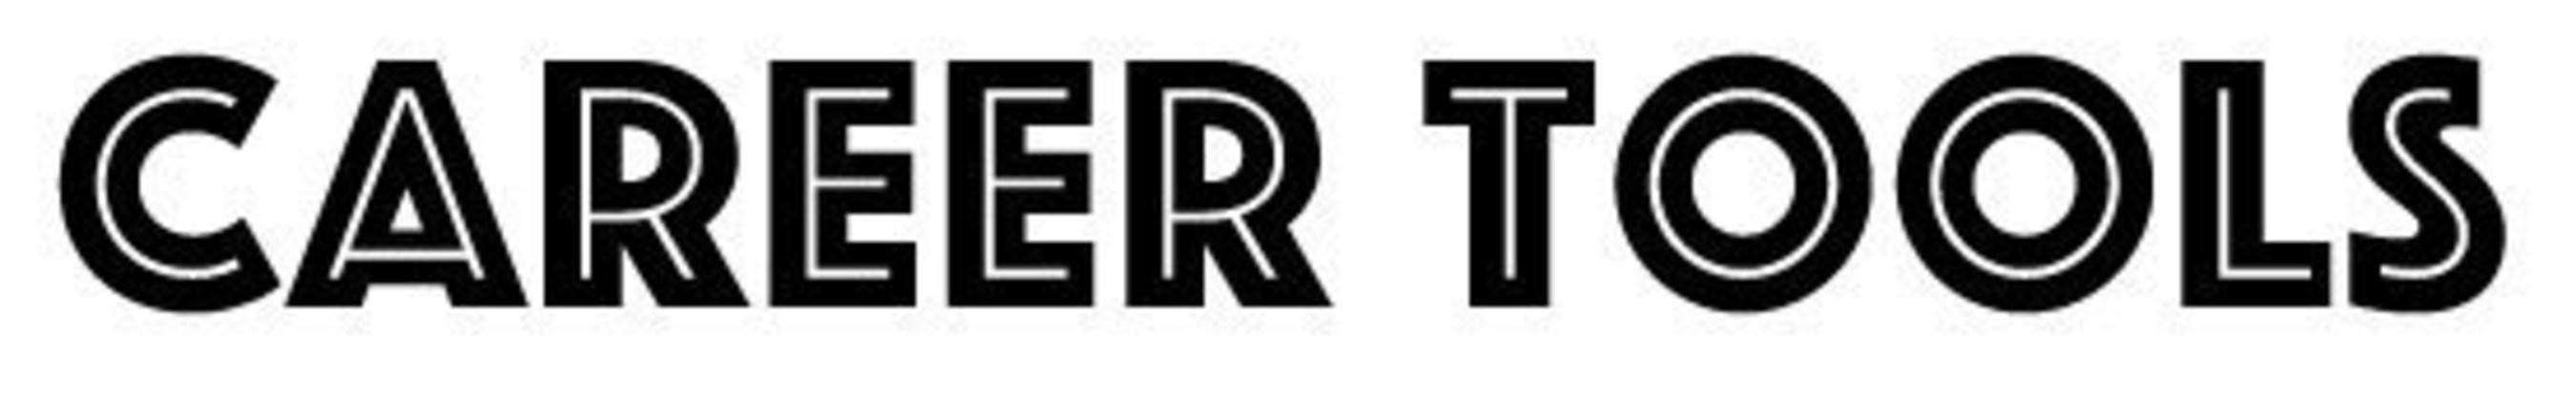 Career Tools Logo